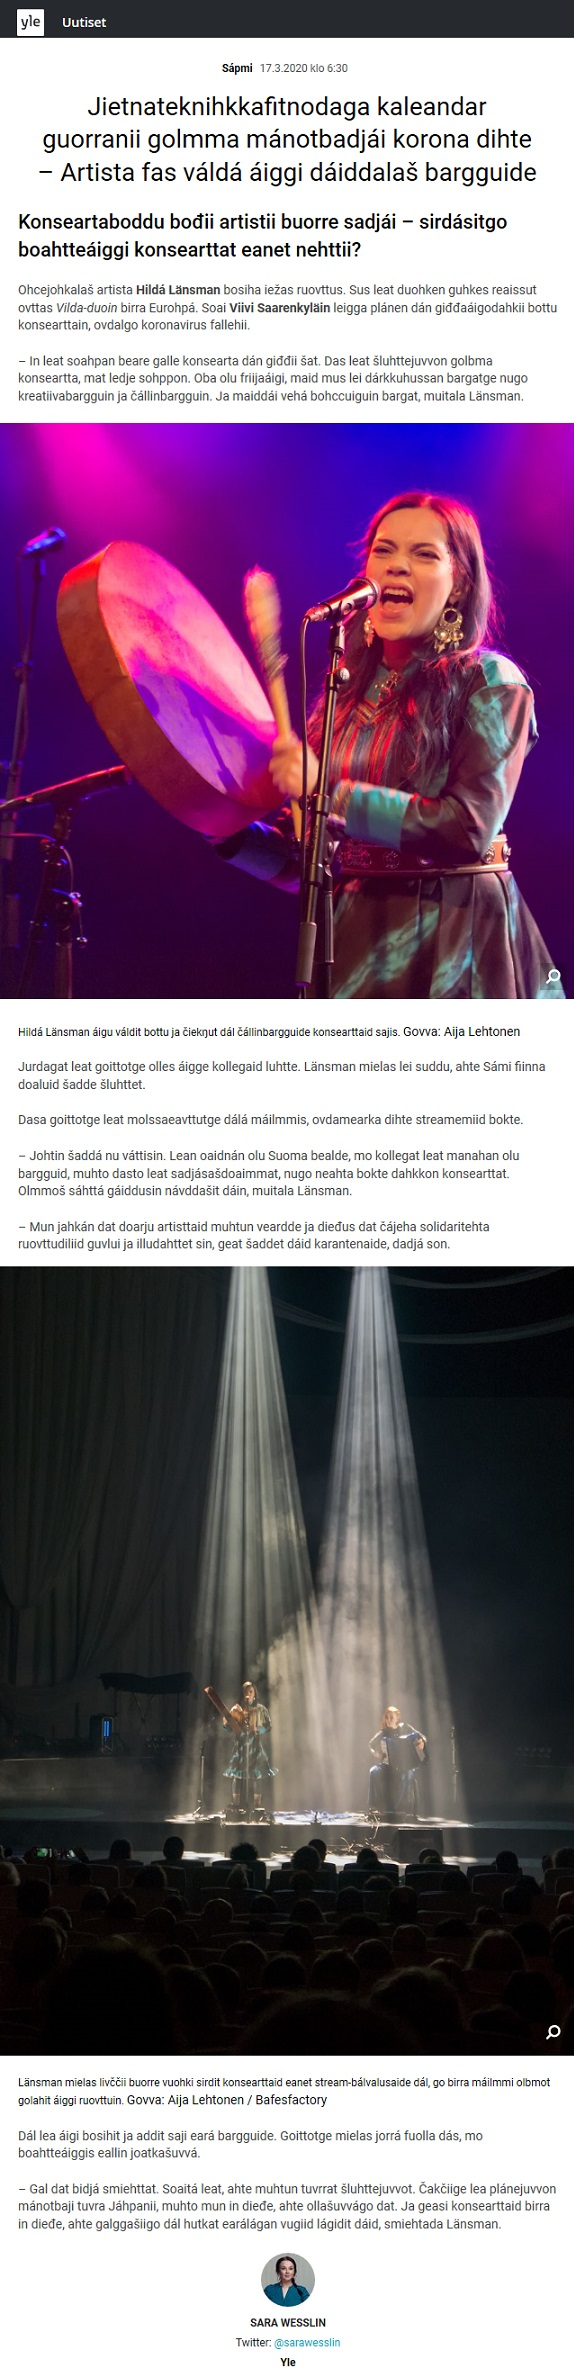 Yle, Sápmi (Finland), 17.3.2020